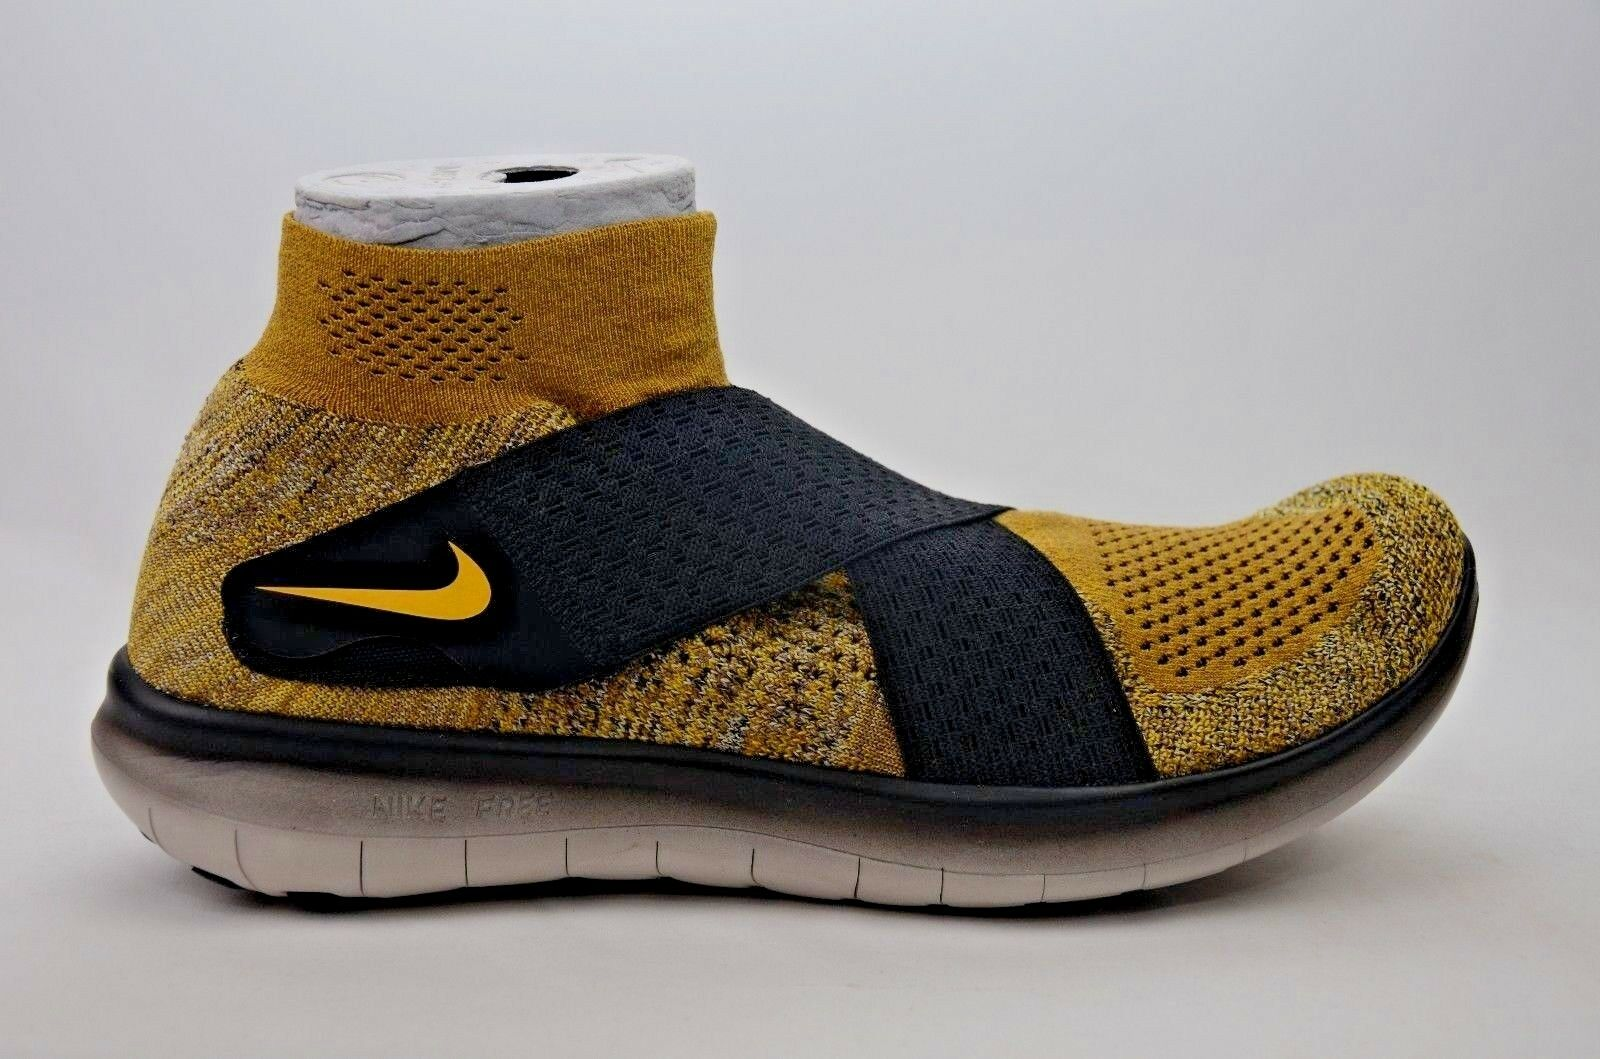 NikeLab Free RN RN RN Motion FK 2017 Men's Running Size 9.5-12.5 New in Box 883291 200 58b822